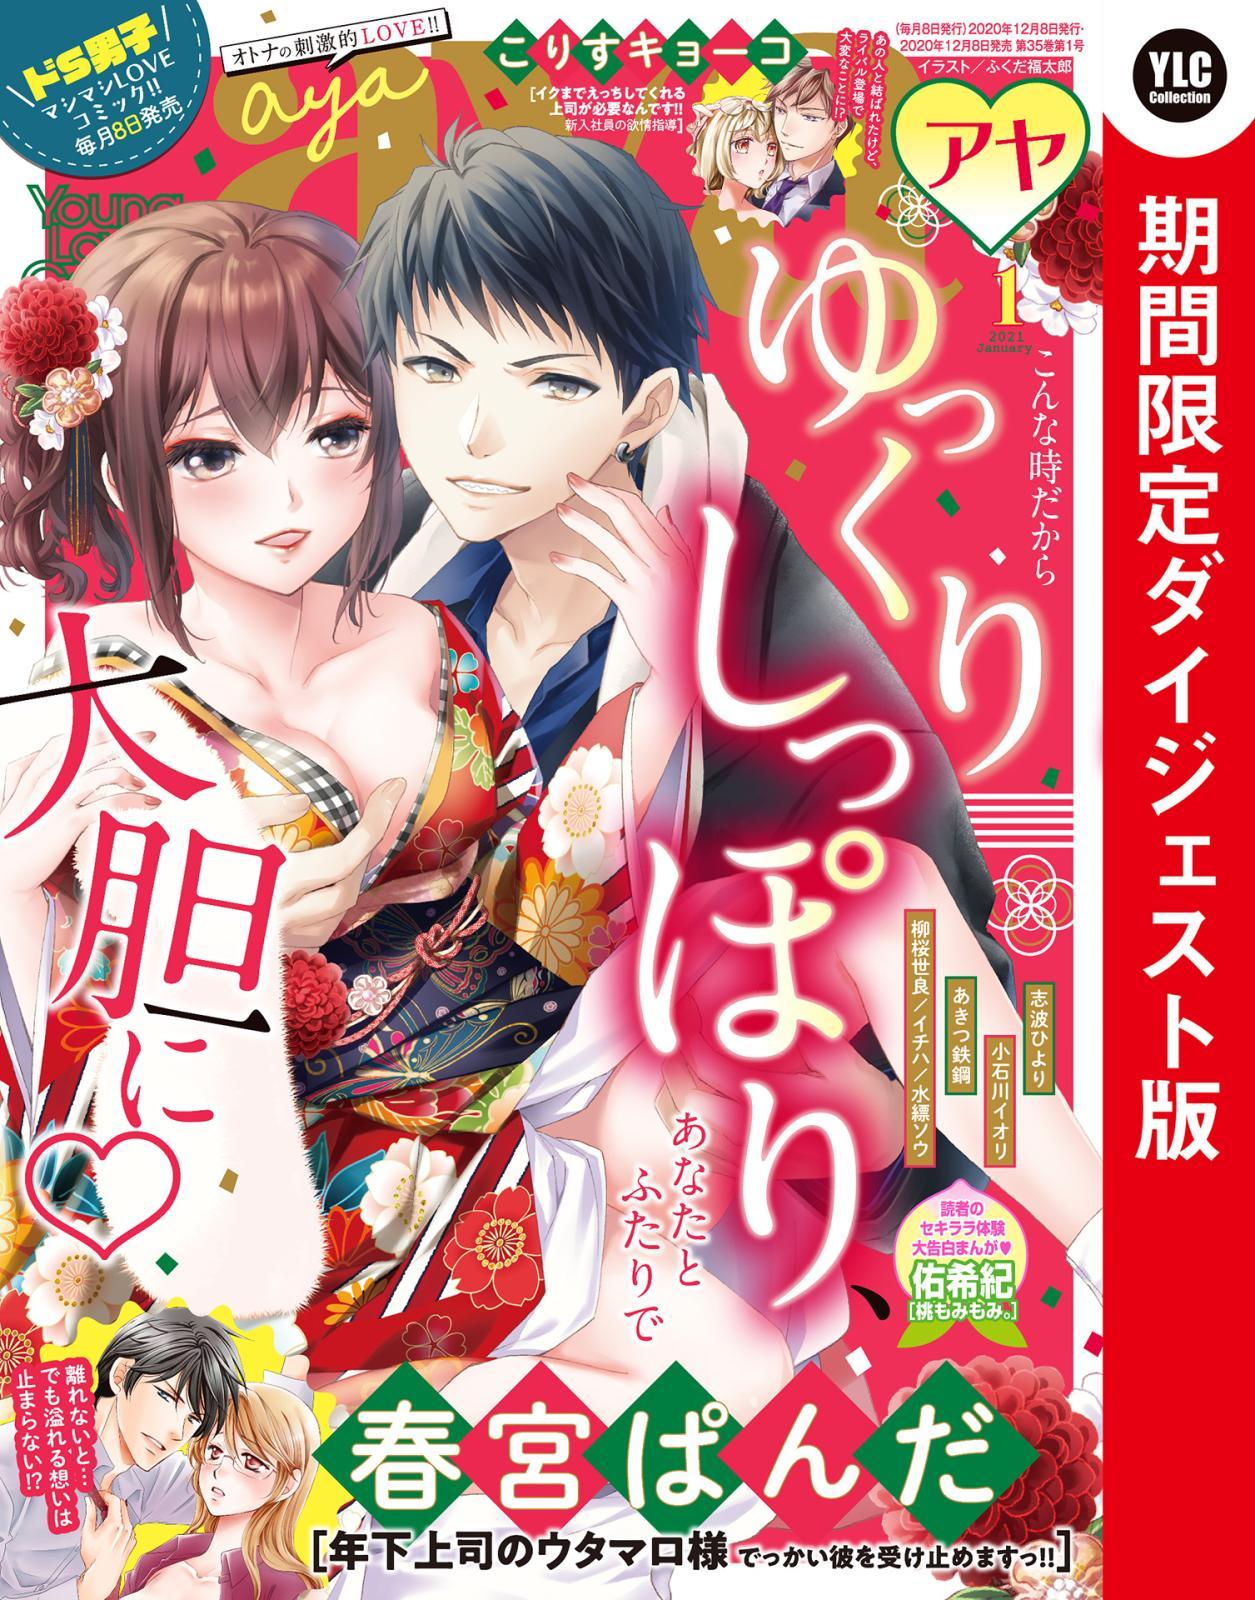 Young Love Comic aya2021年1月号 ダイジェスト版